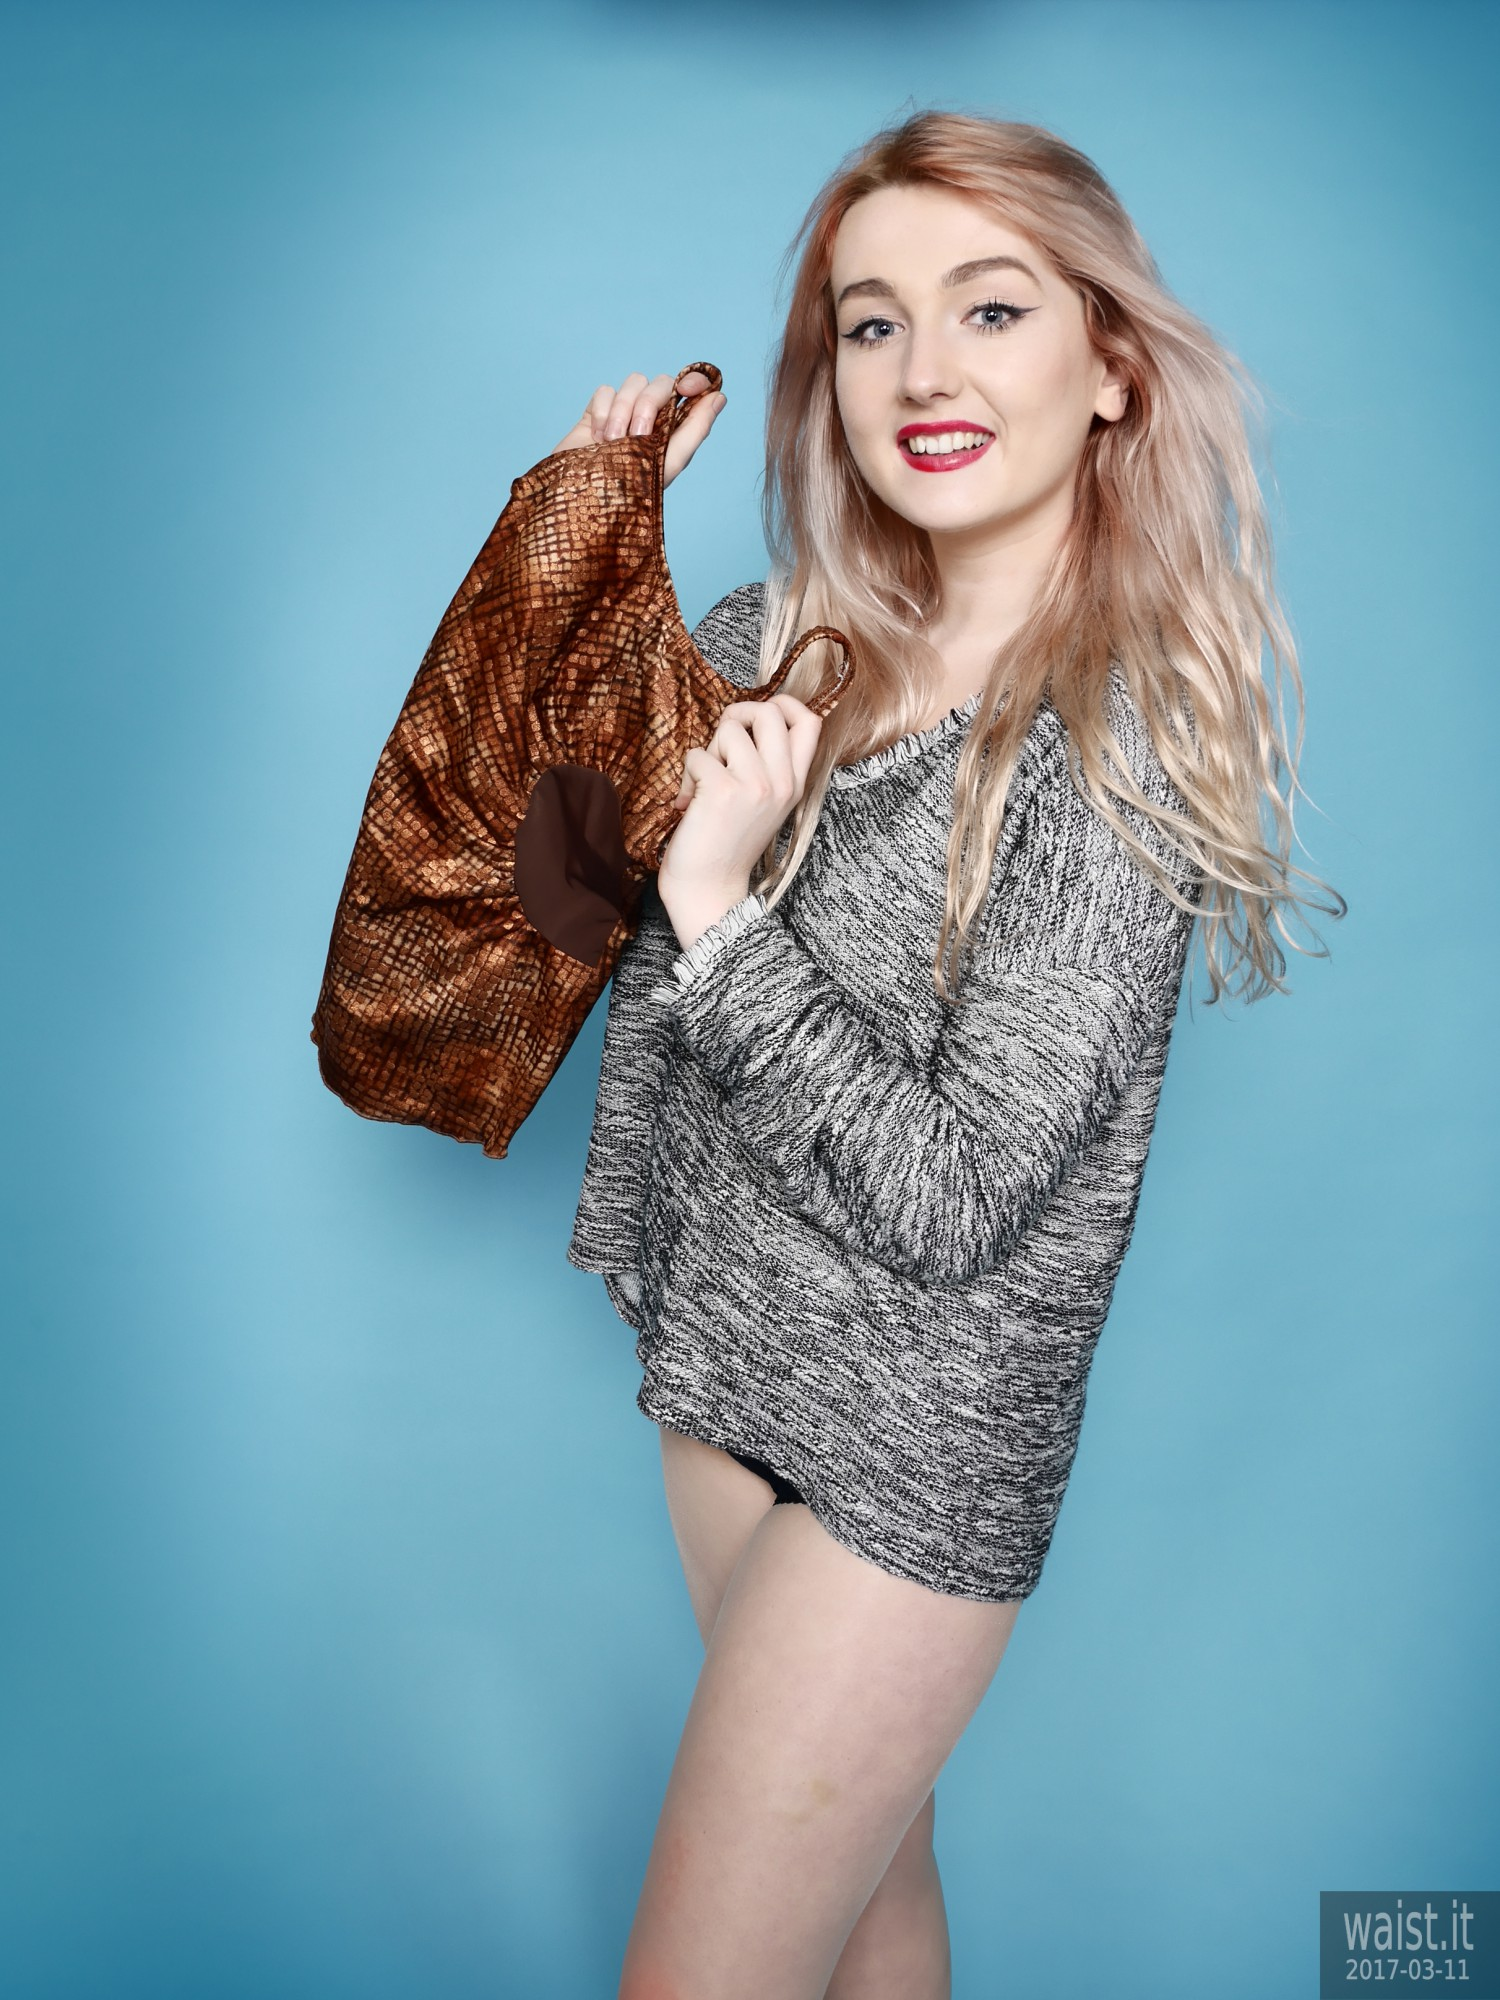 2017-03-11 LilyAmber sweater girl